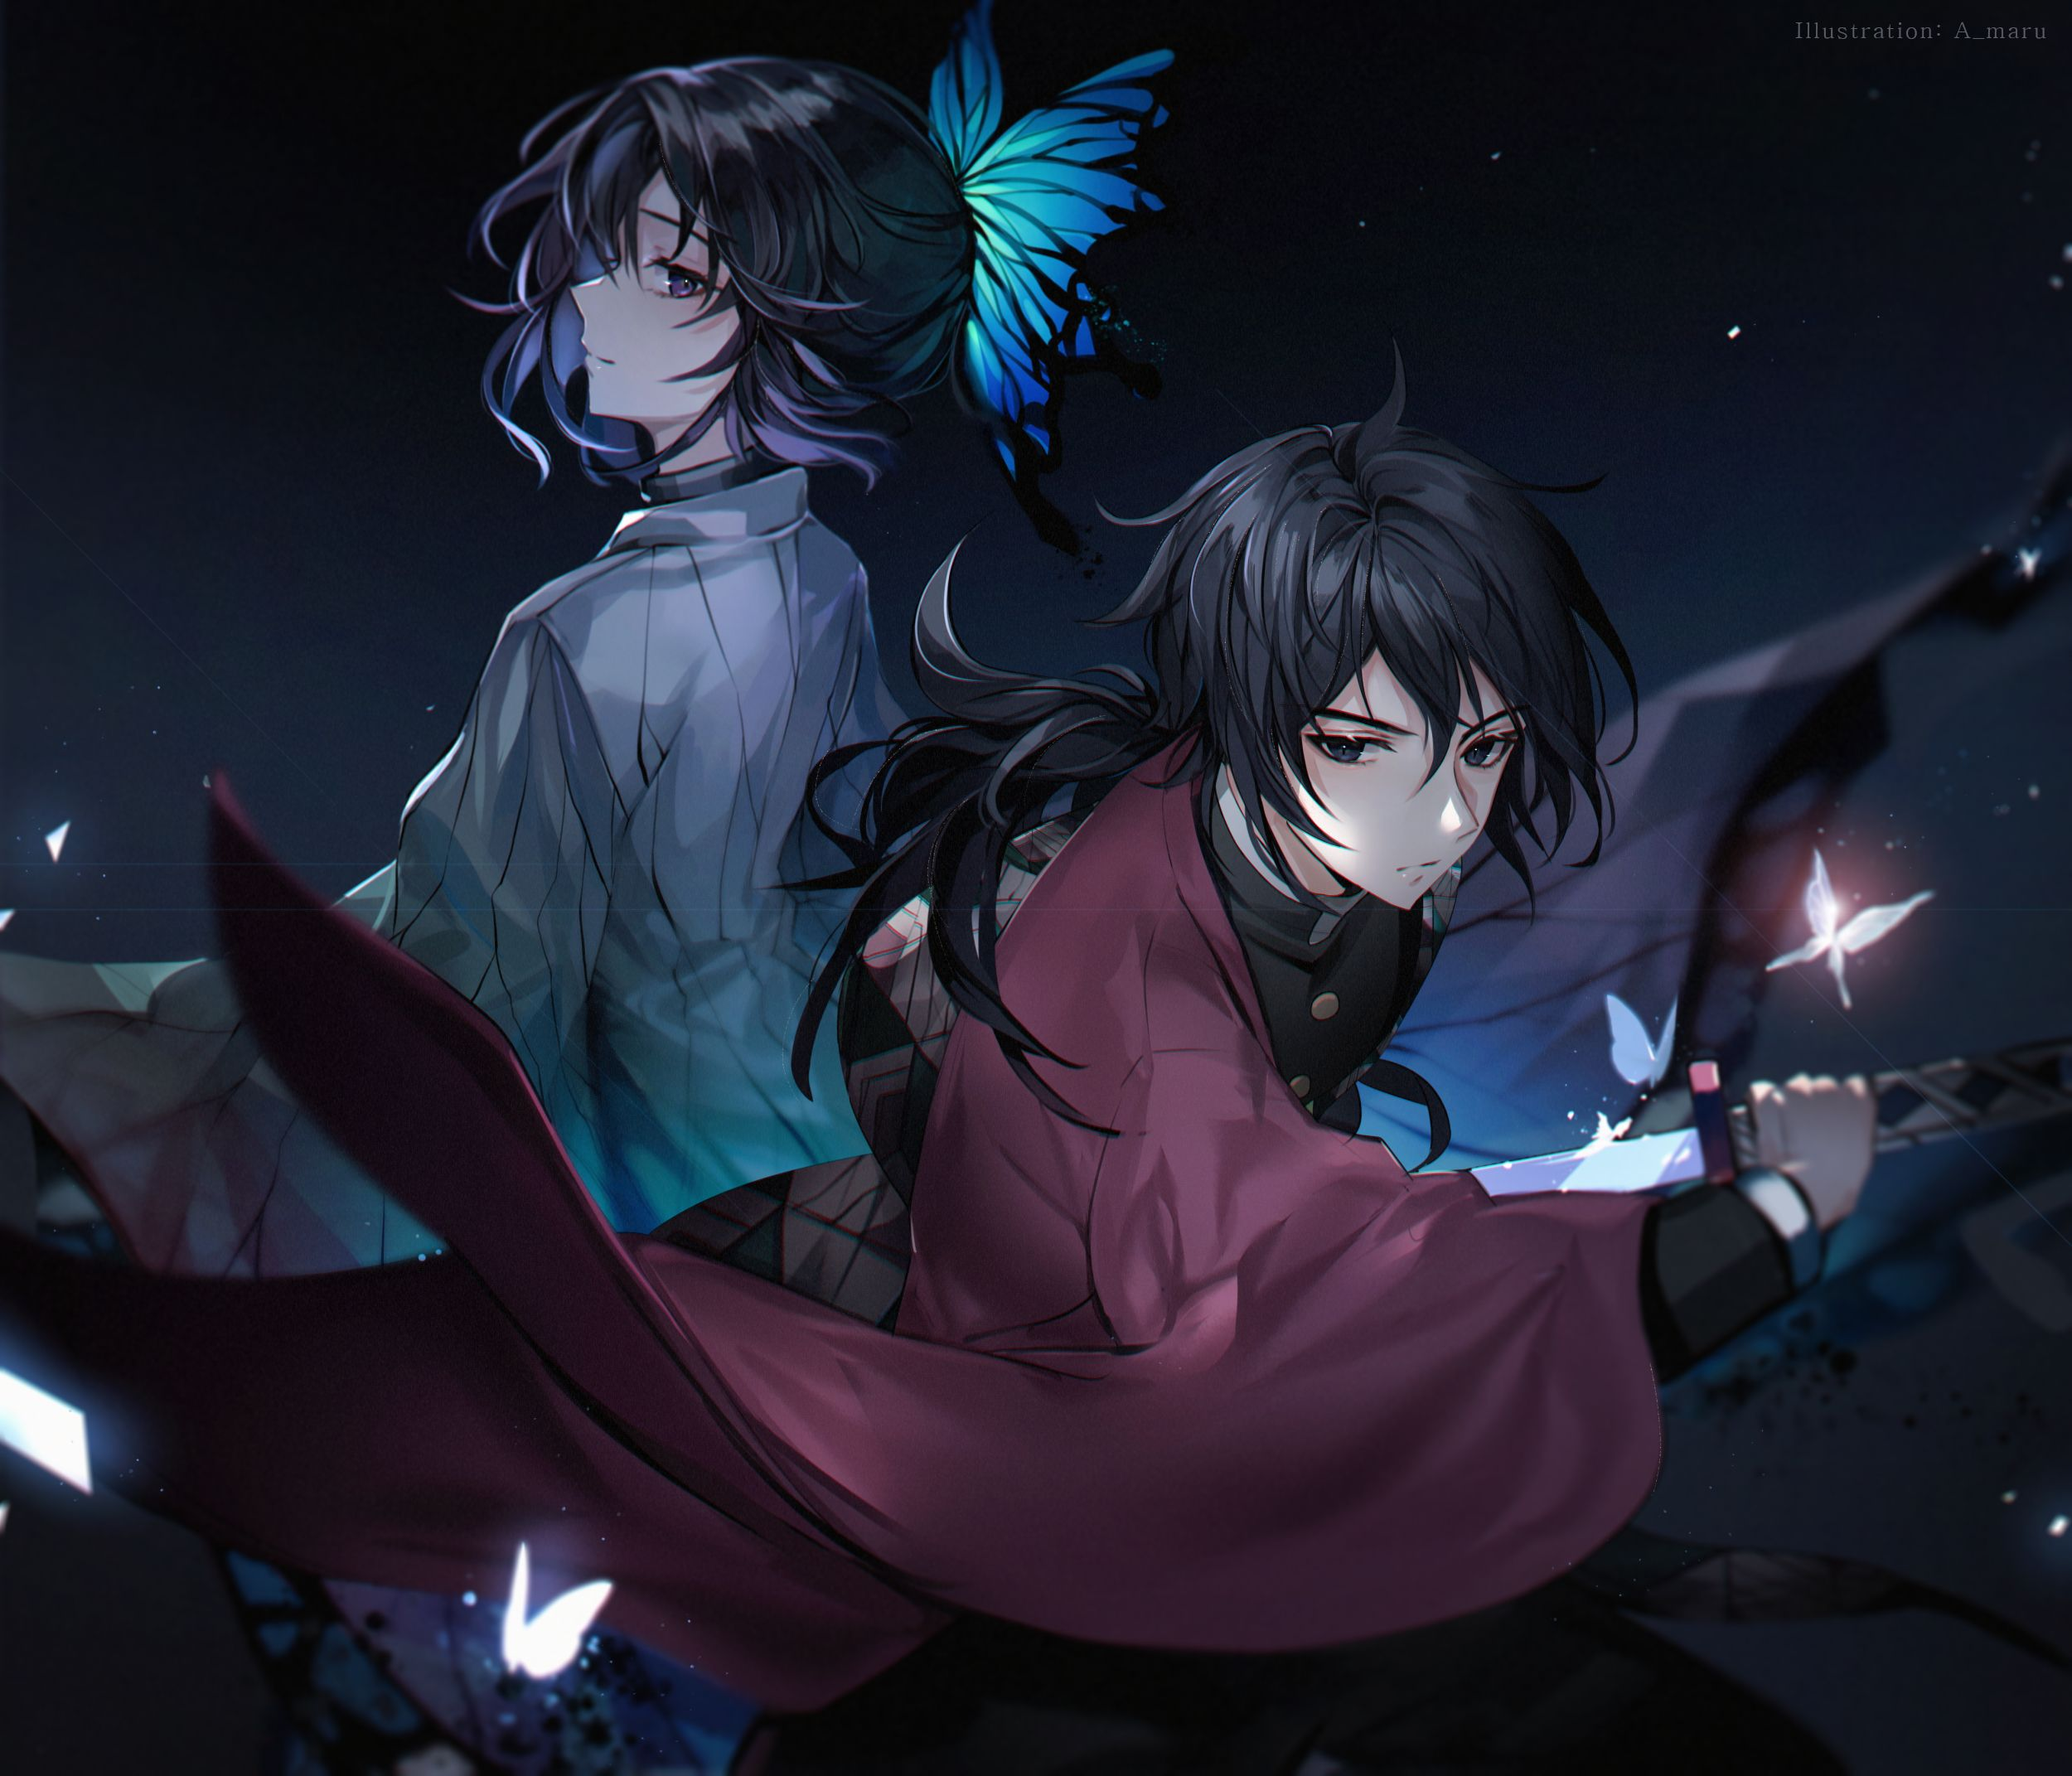 anime animewallpapers beautiful kawaii beautifulanime